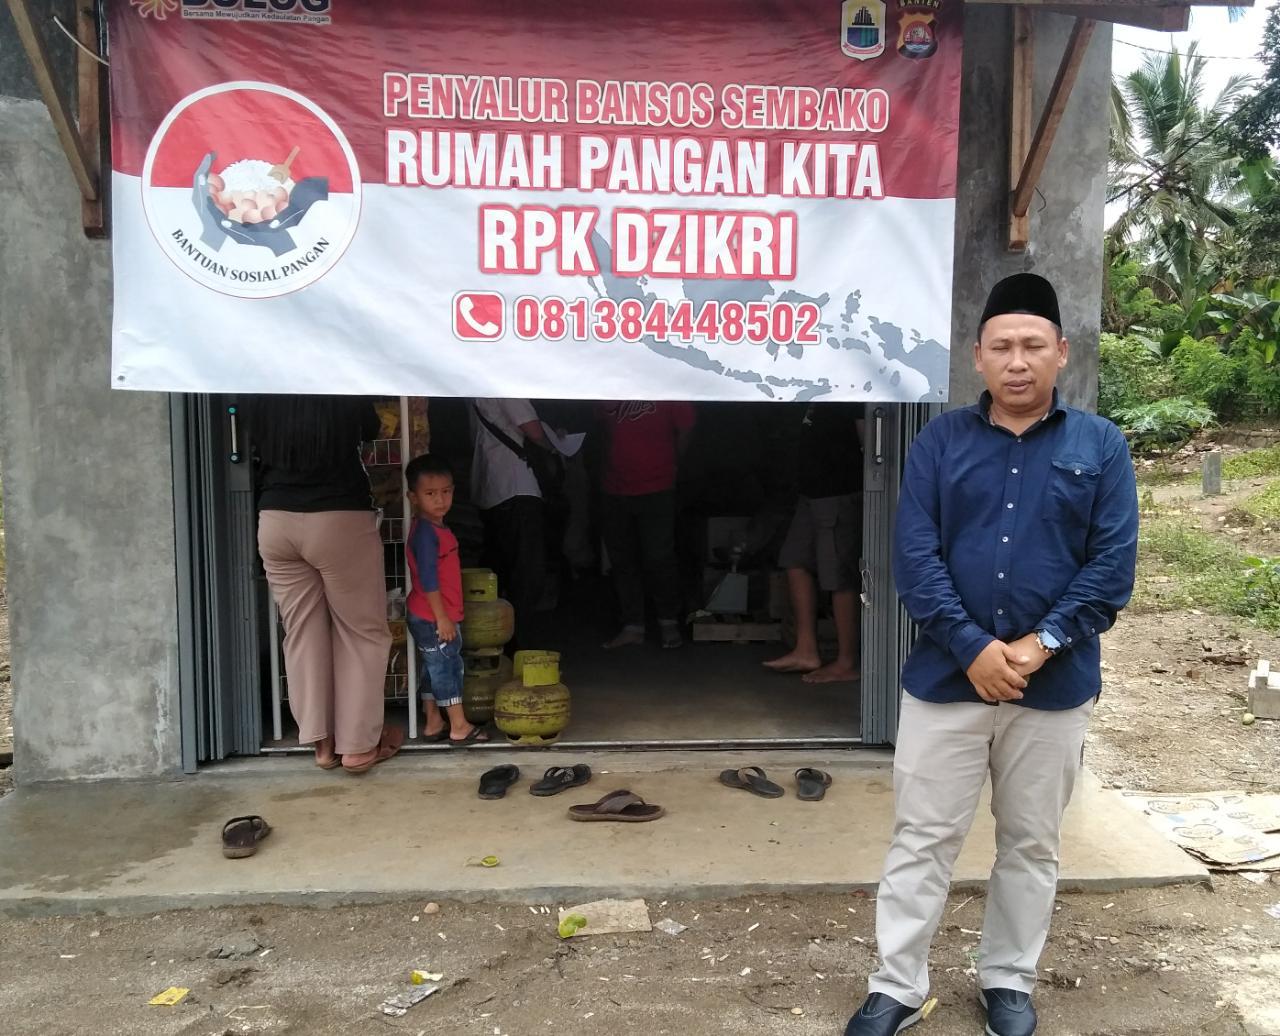 Gambar Legislator DPRD Lebak Menilai Penyaluran Program Sembako Di Lebak Semakin Samrawut 13